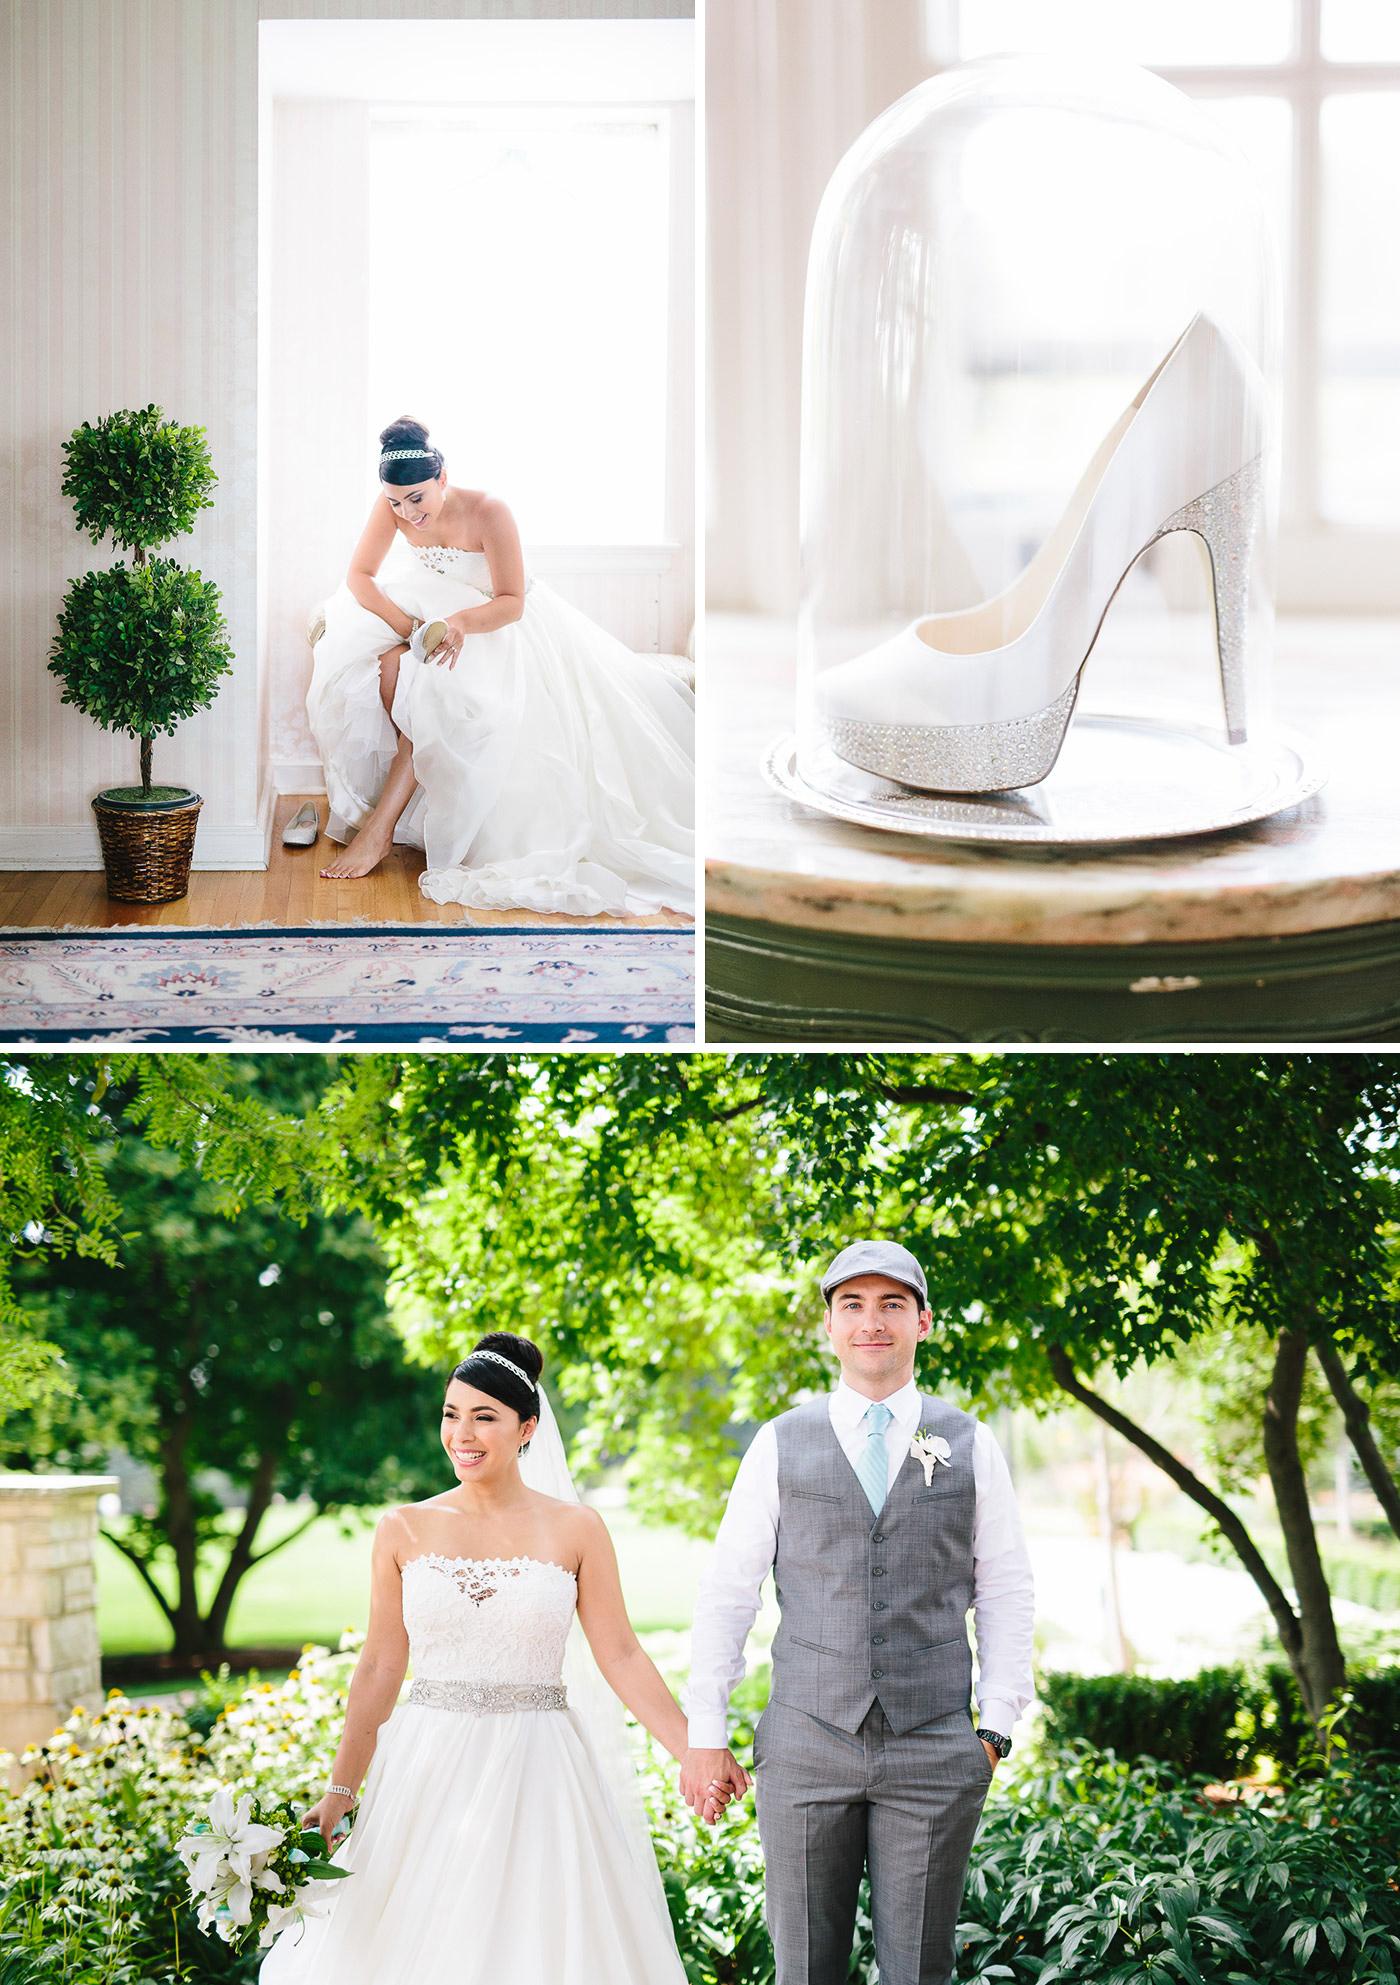 Chicago_Fine_Art_Wedding_Photography_omeara1.jpg